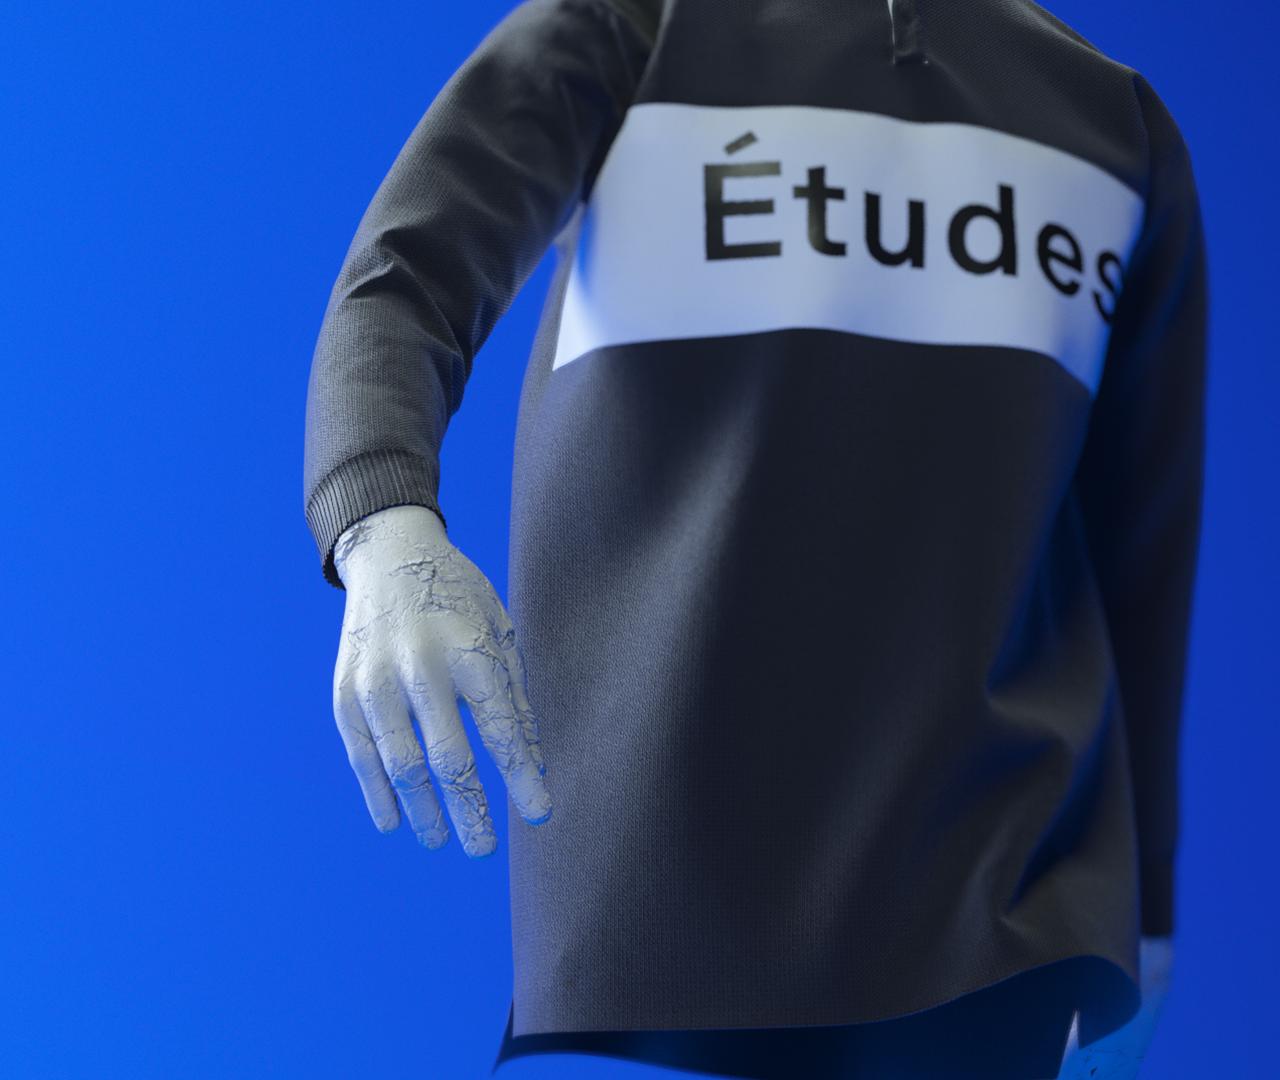 ETUDE_insta2.png